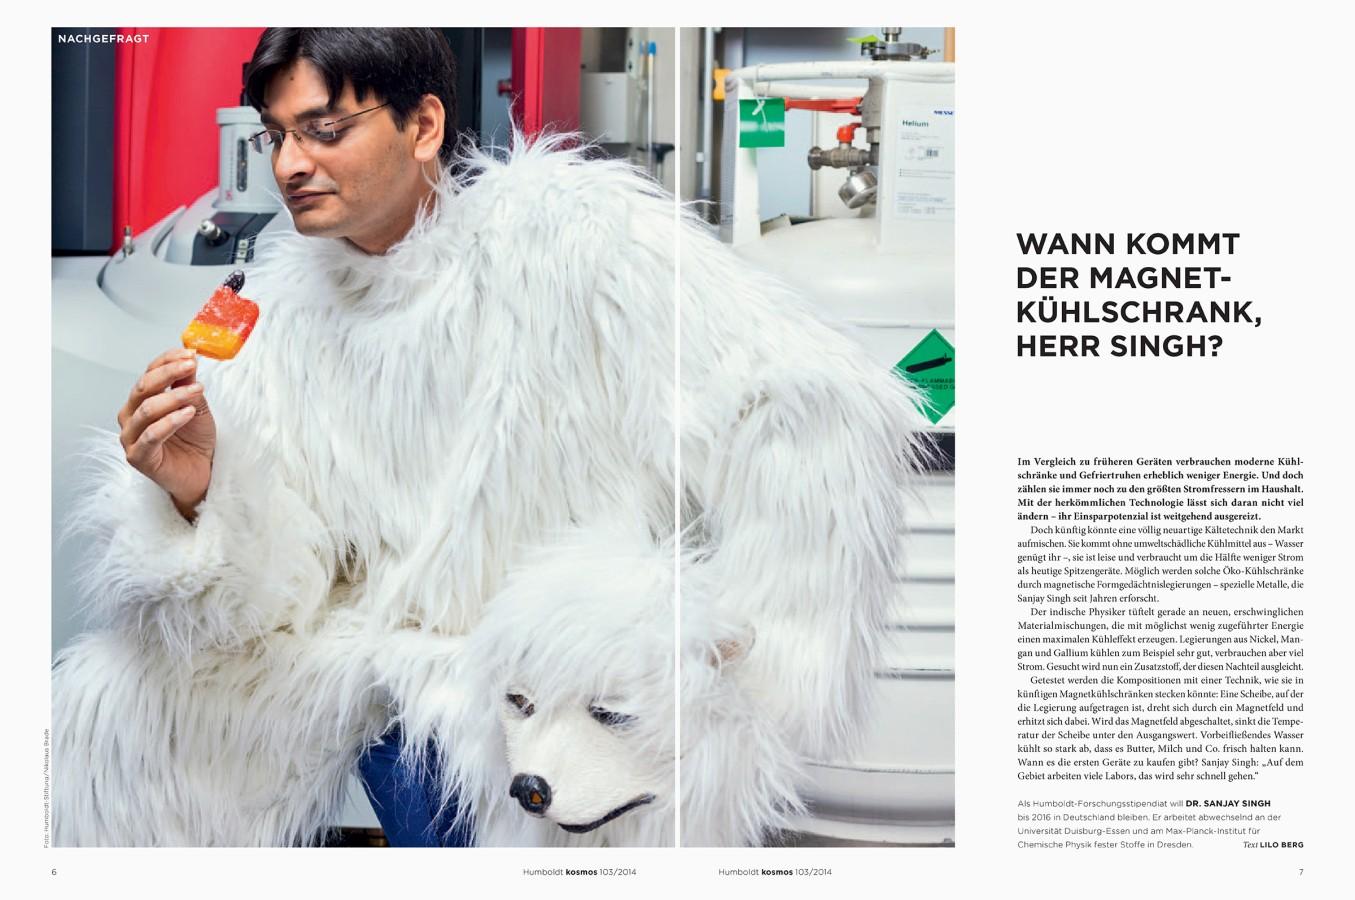 Sanjay Singh at Max-Planck-Institute in Dresden by Nikolaus Brade.